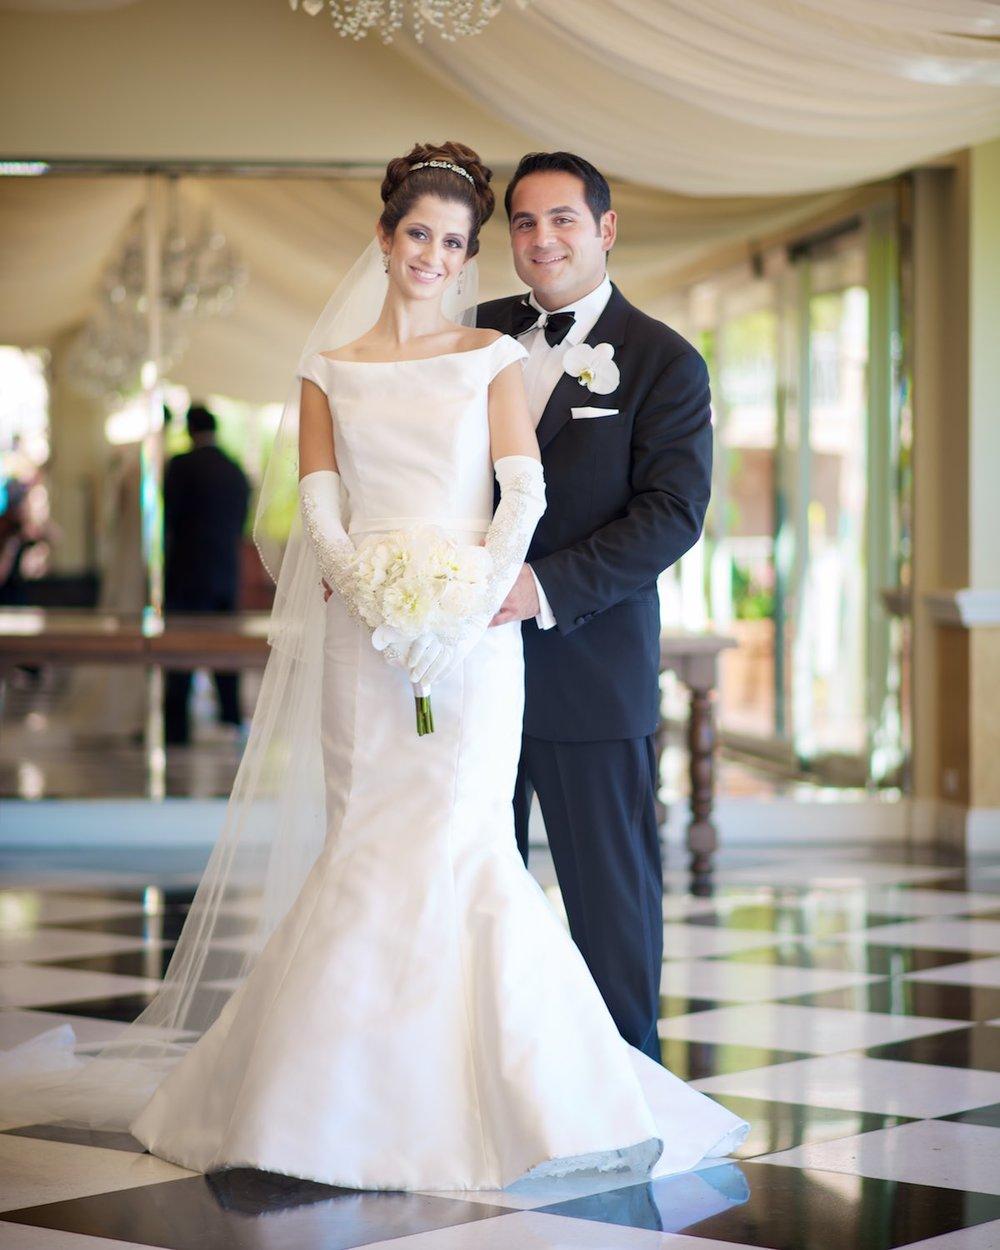 la-valencia-wedding-michal-pfeil-17.jpg